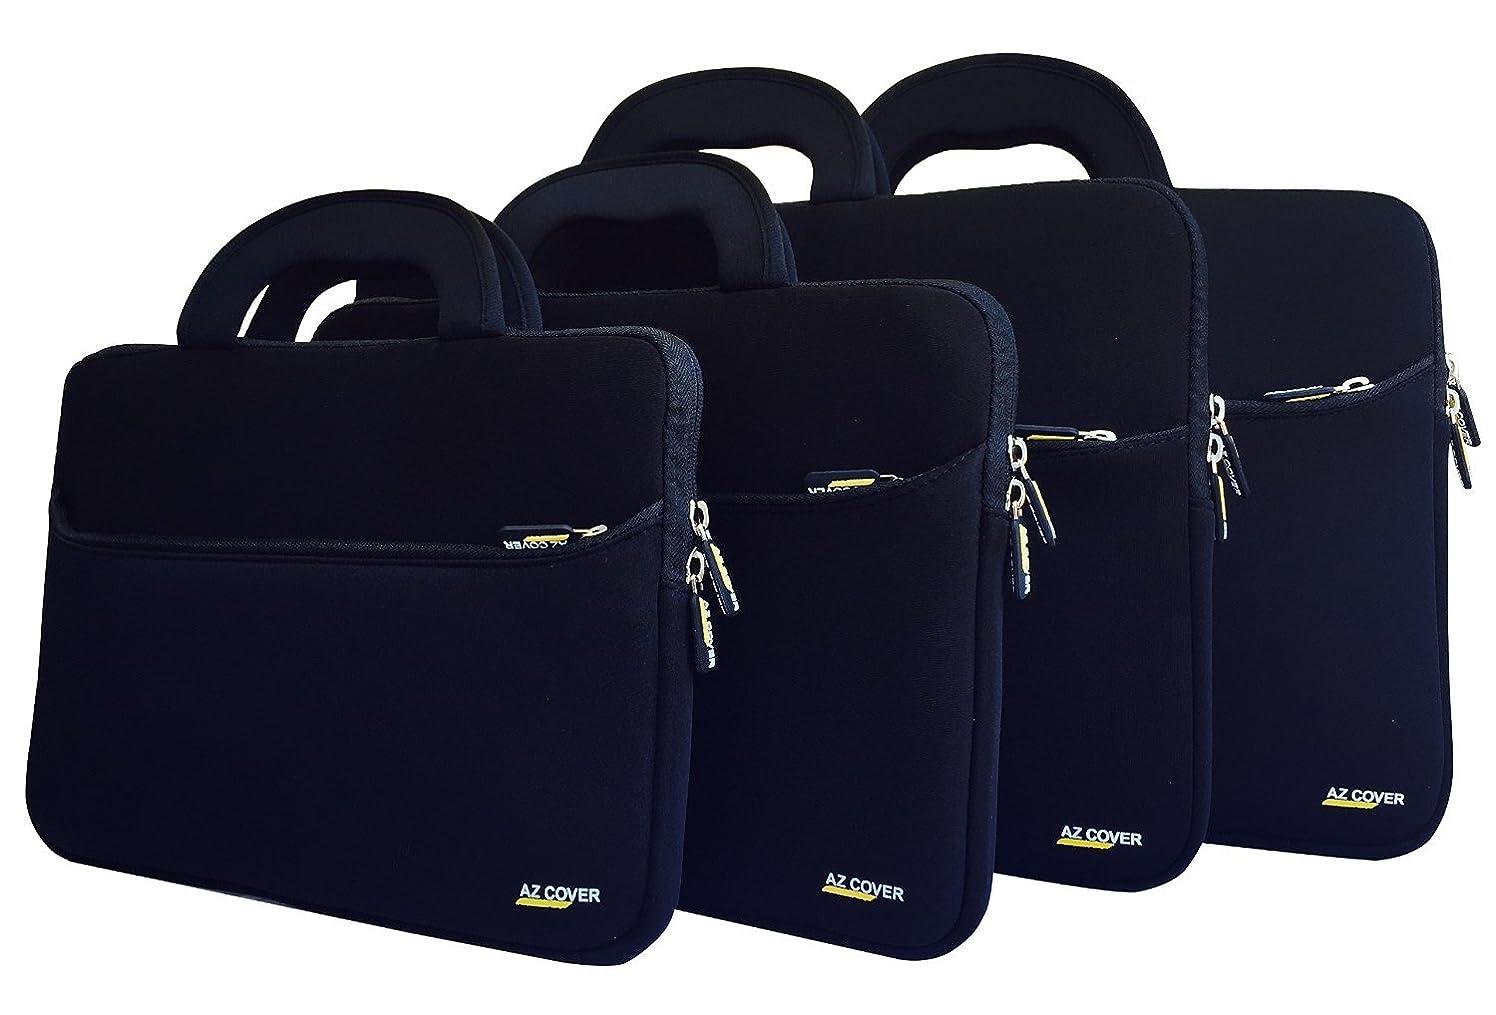 AZ-Cover 15.6-Inch Laptop Sleeve Case Bag (Black) With Handle For Lenovo Z50-70 Laptop Computer-59436278